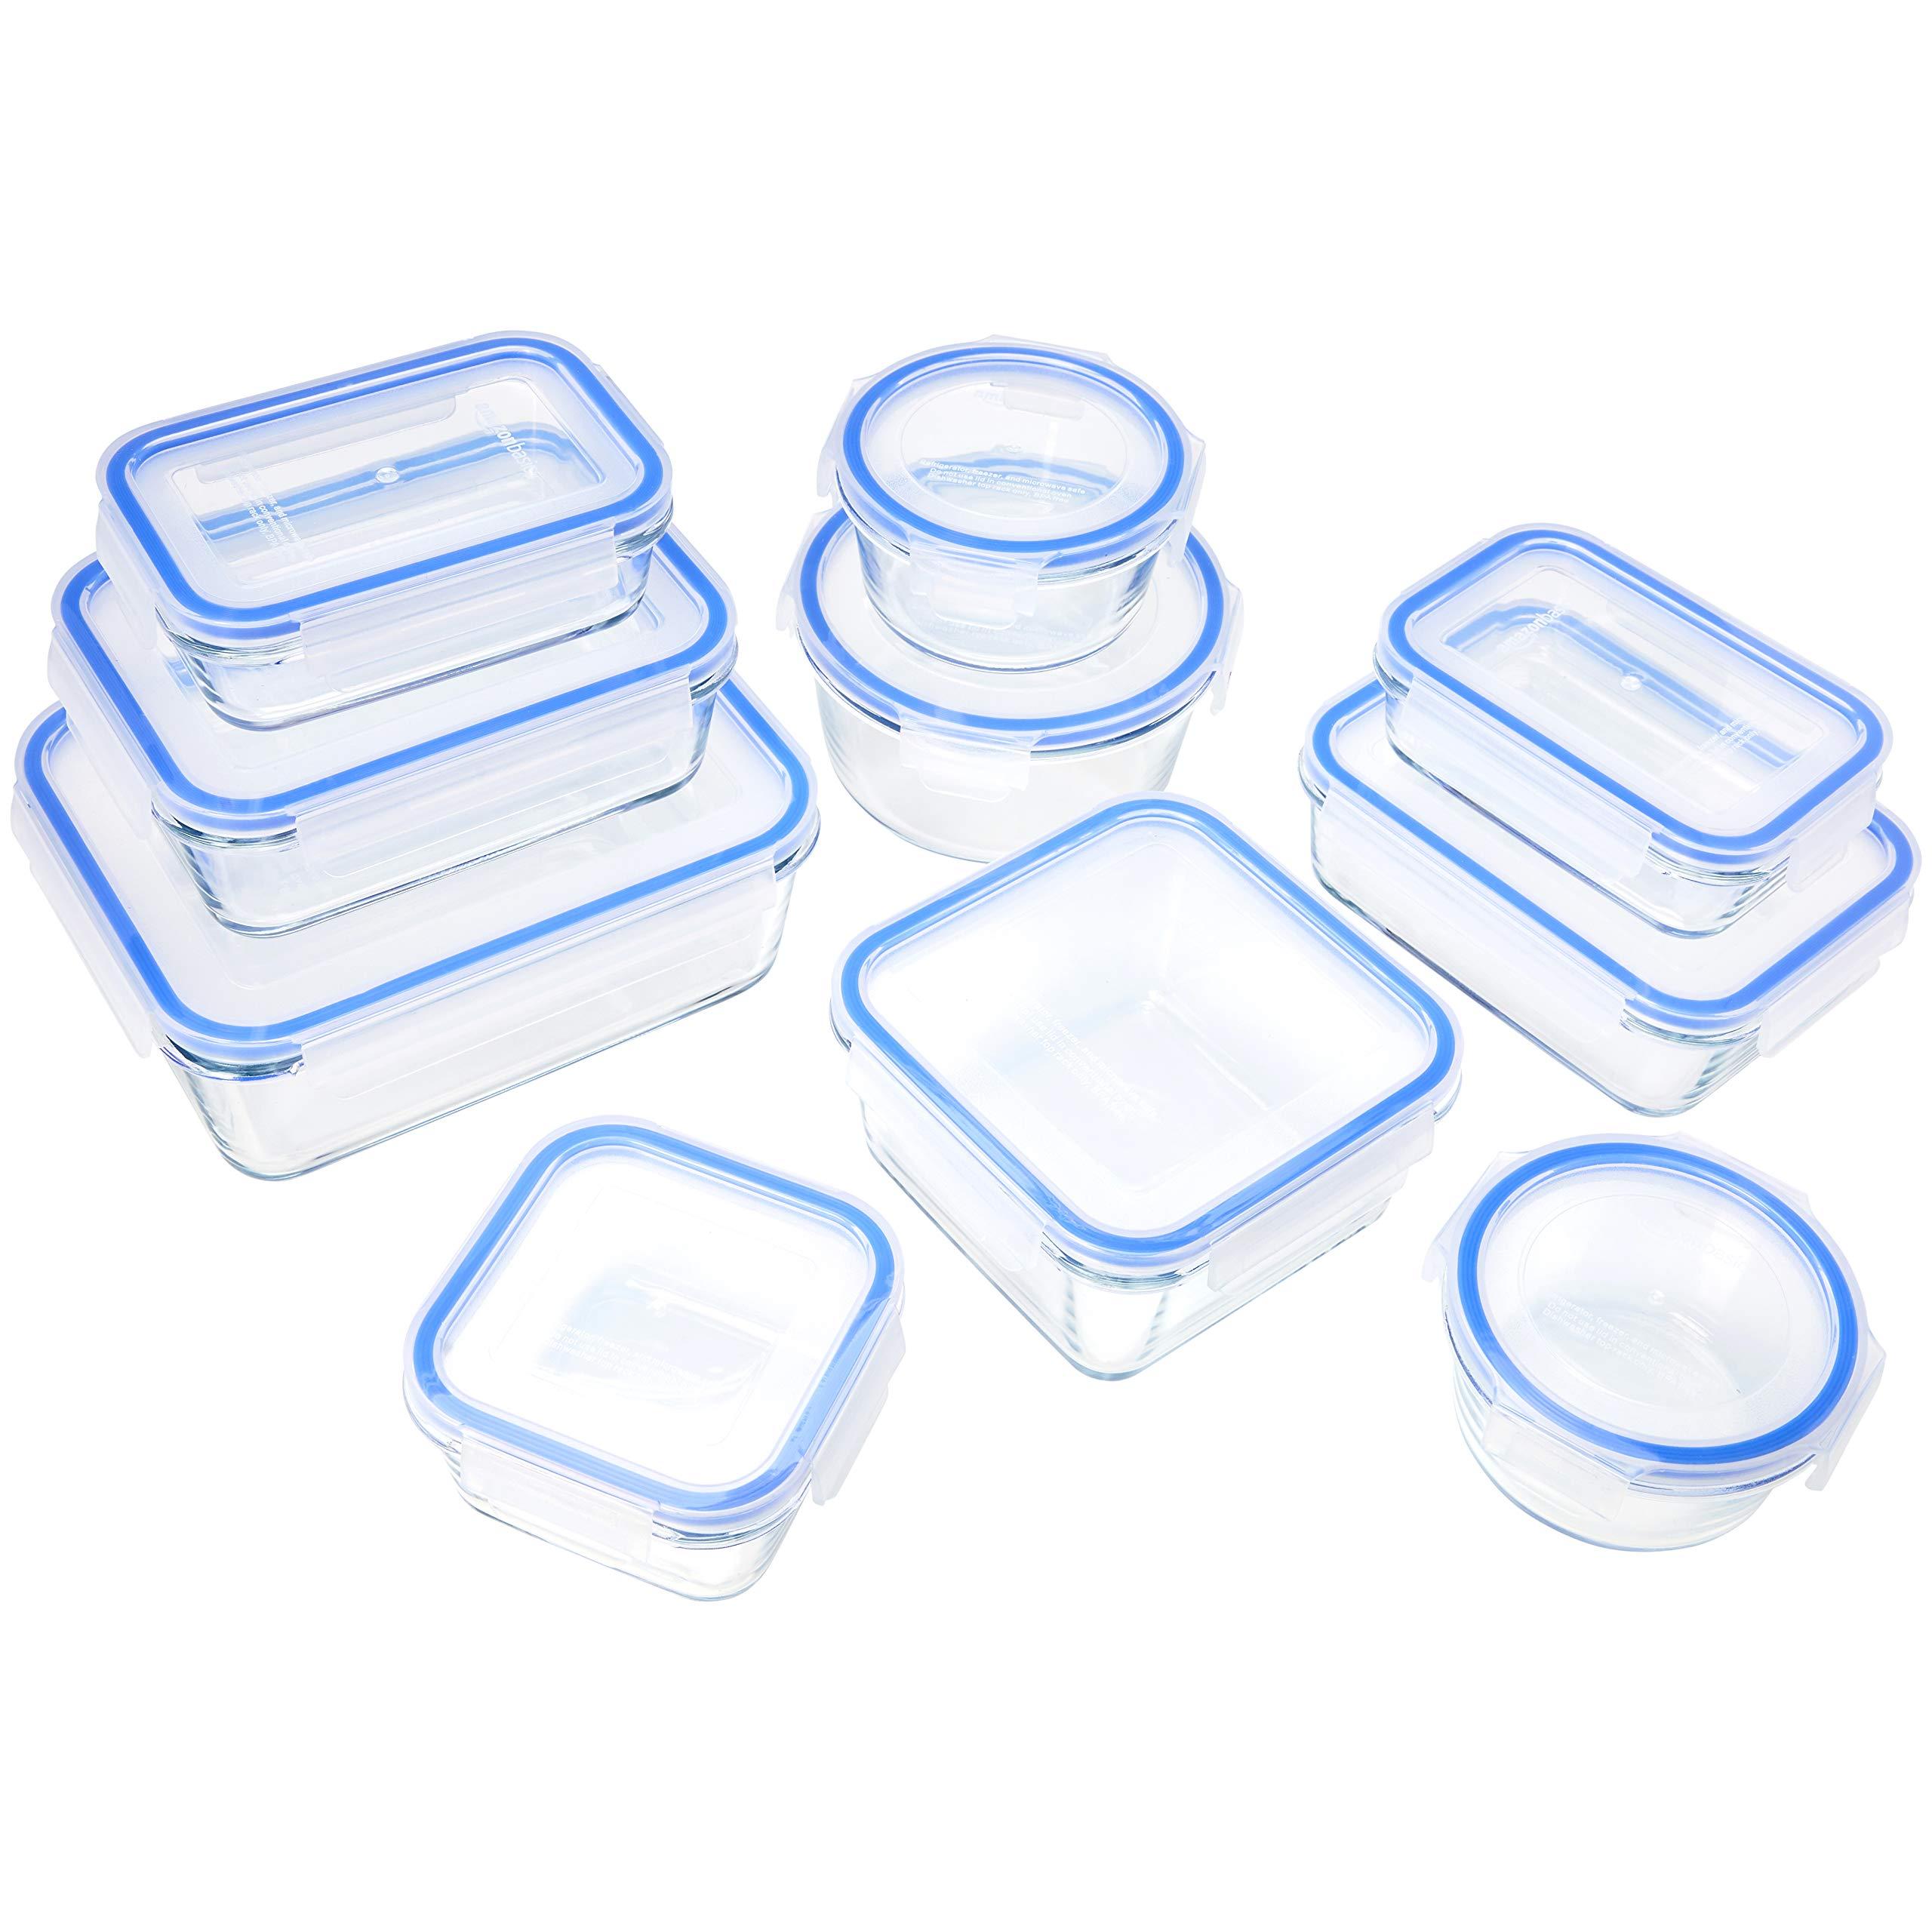 AmazonBasics Glass Locking Food Storage Containers - 20-Piece Set